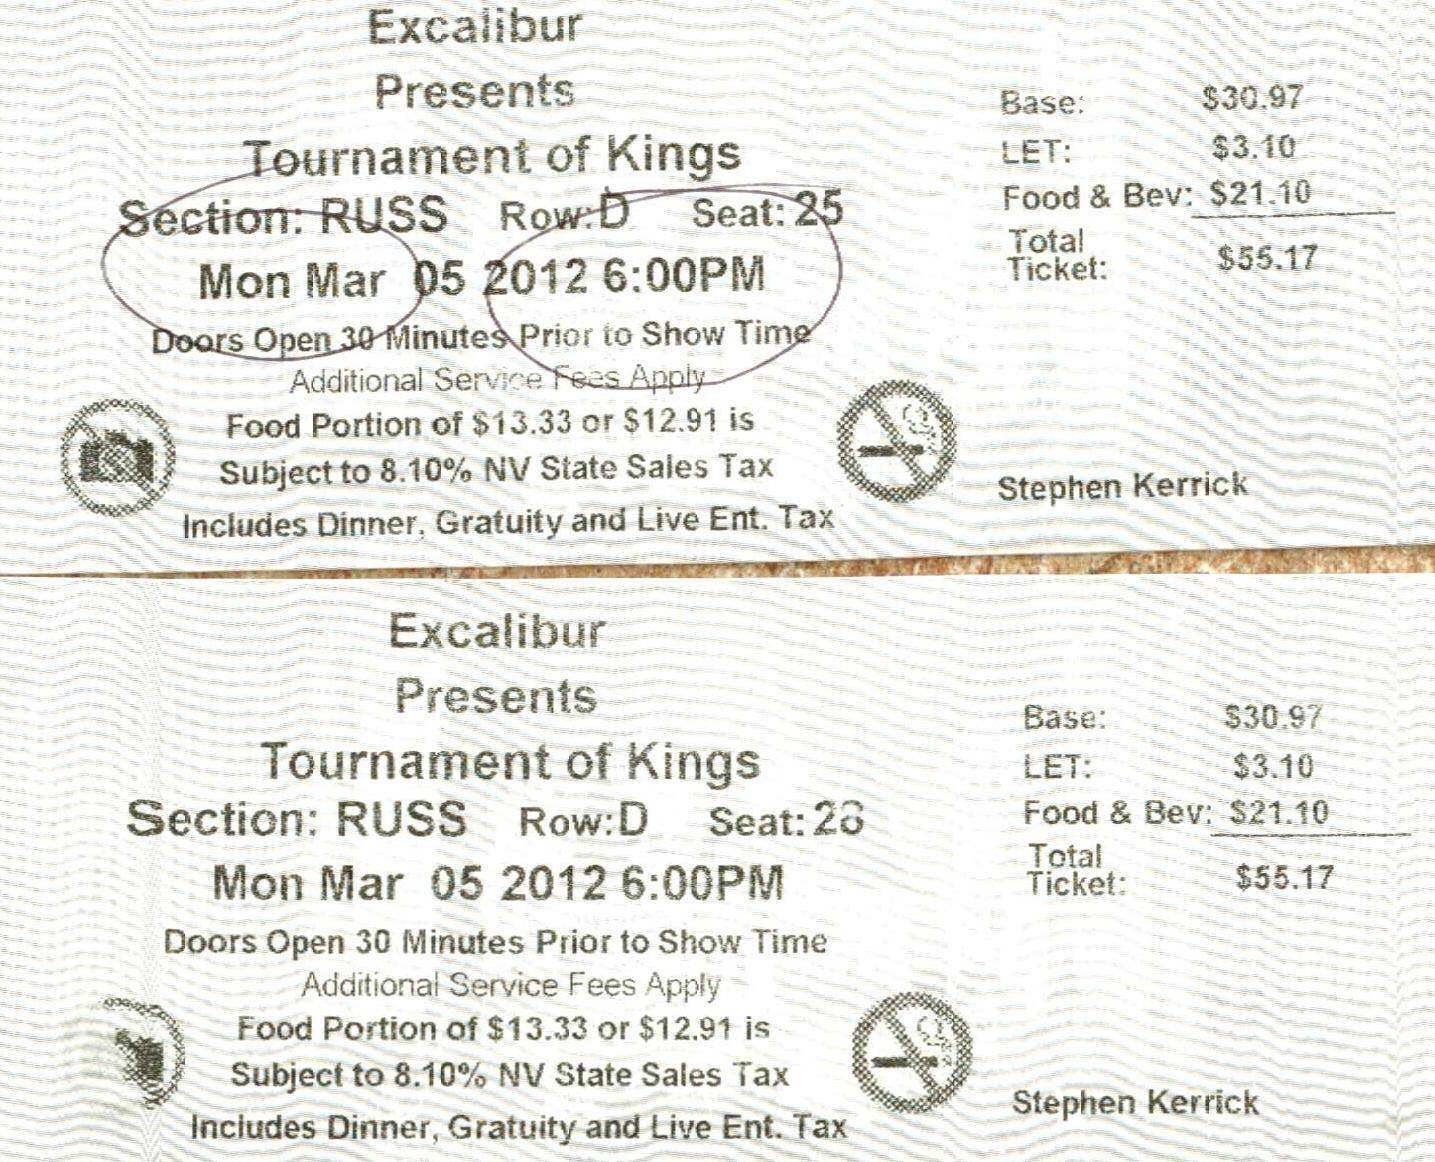 Excalibur Tournament of Kings